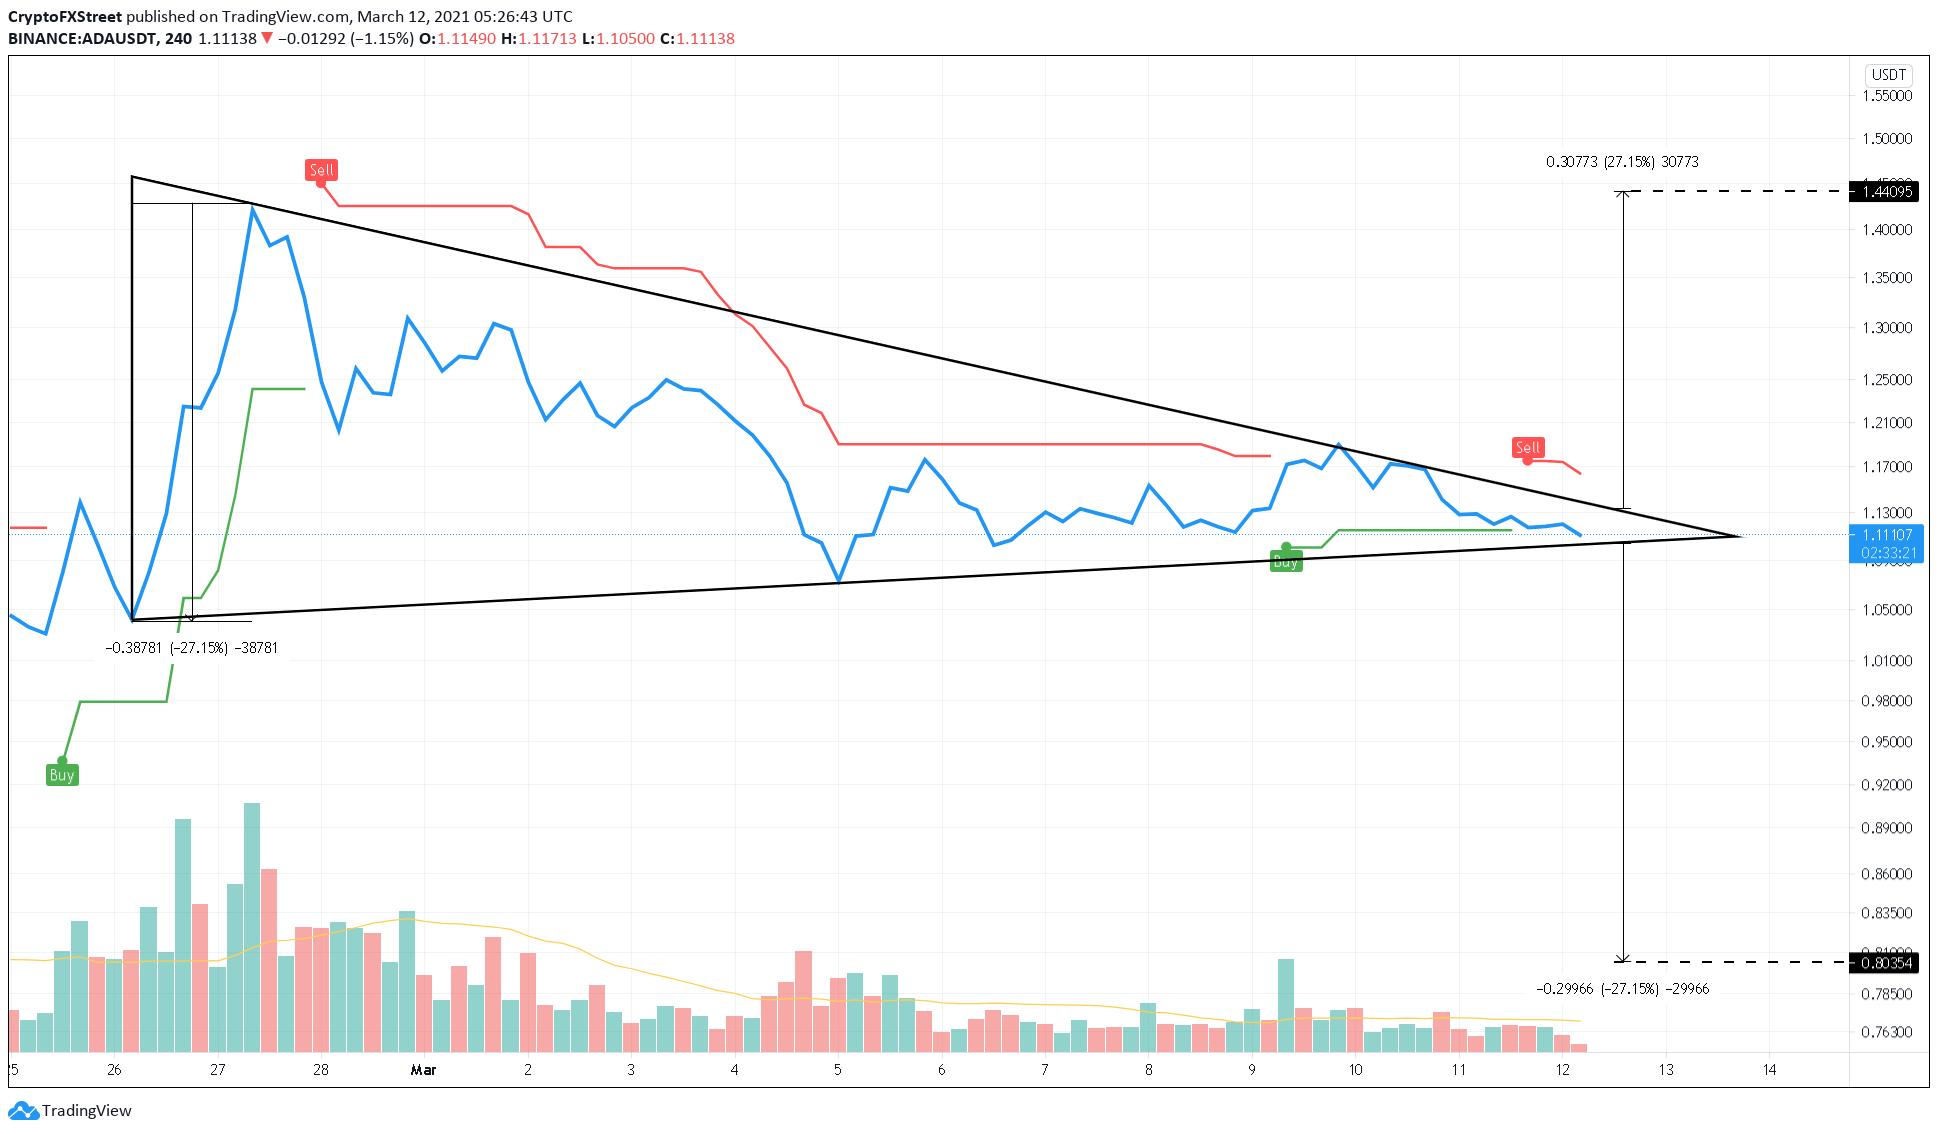 Cardano 4-hour chart